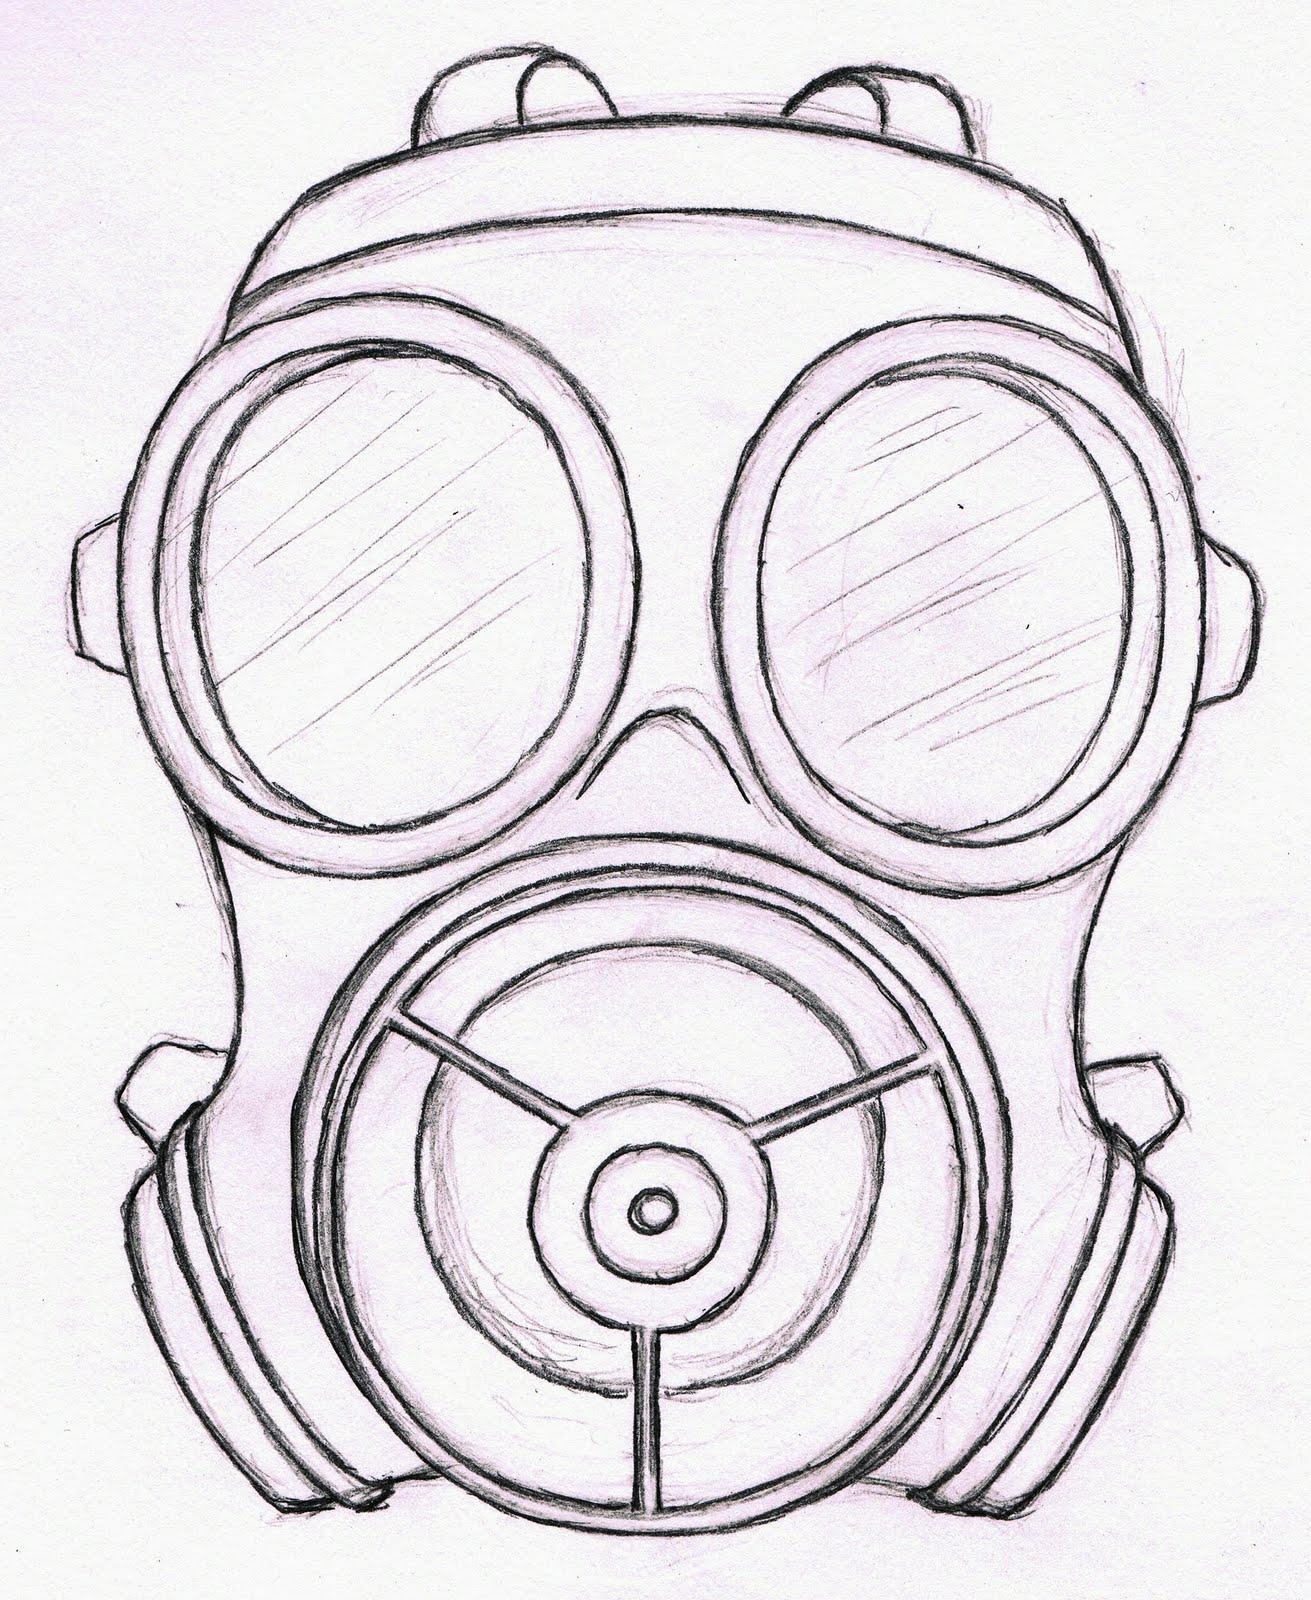 gallyazel travail sur les masques gaz croquis. Black Bedroom Furniture Sets. Home Design Ideas